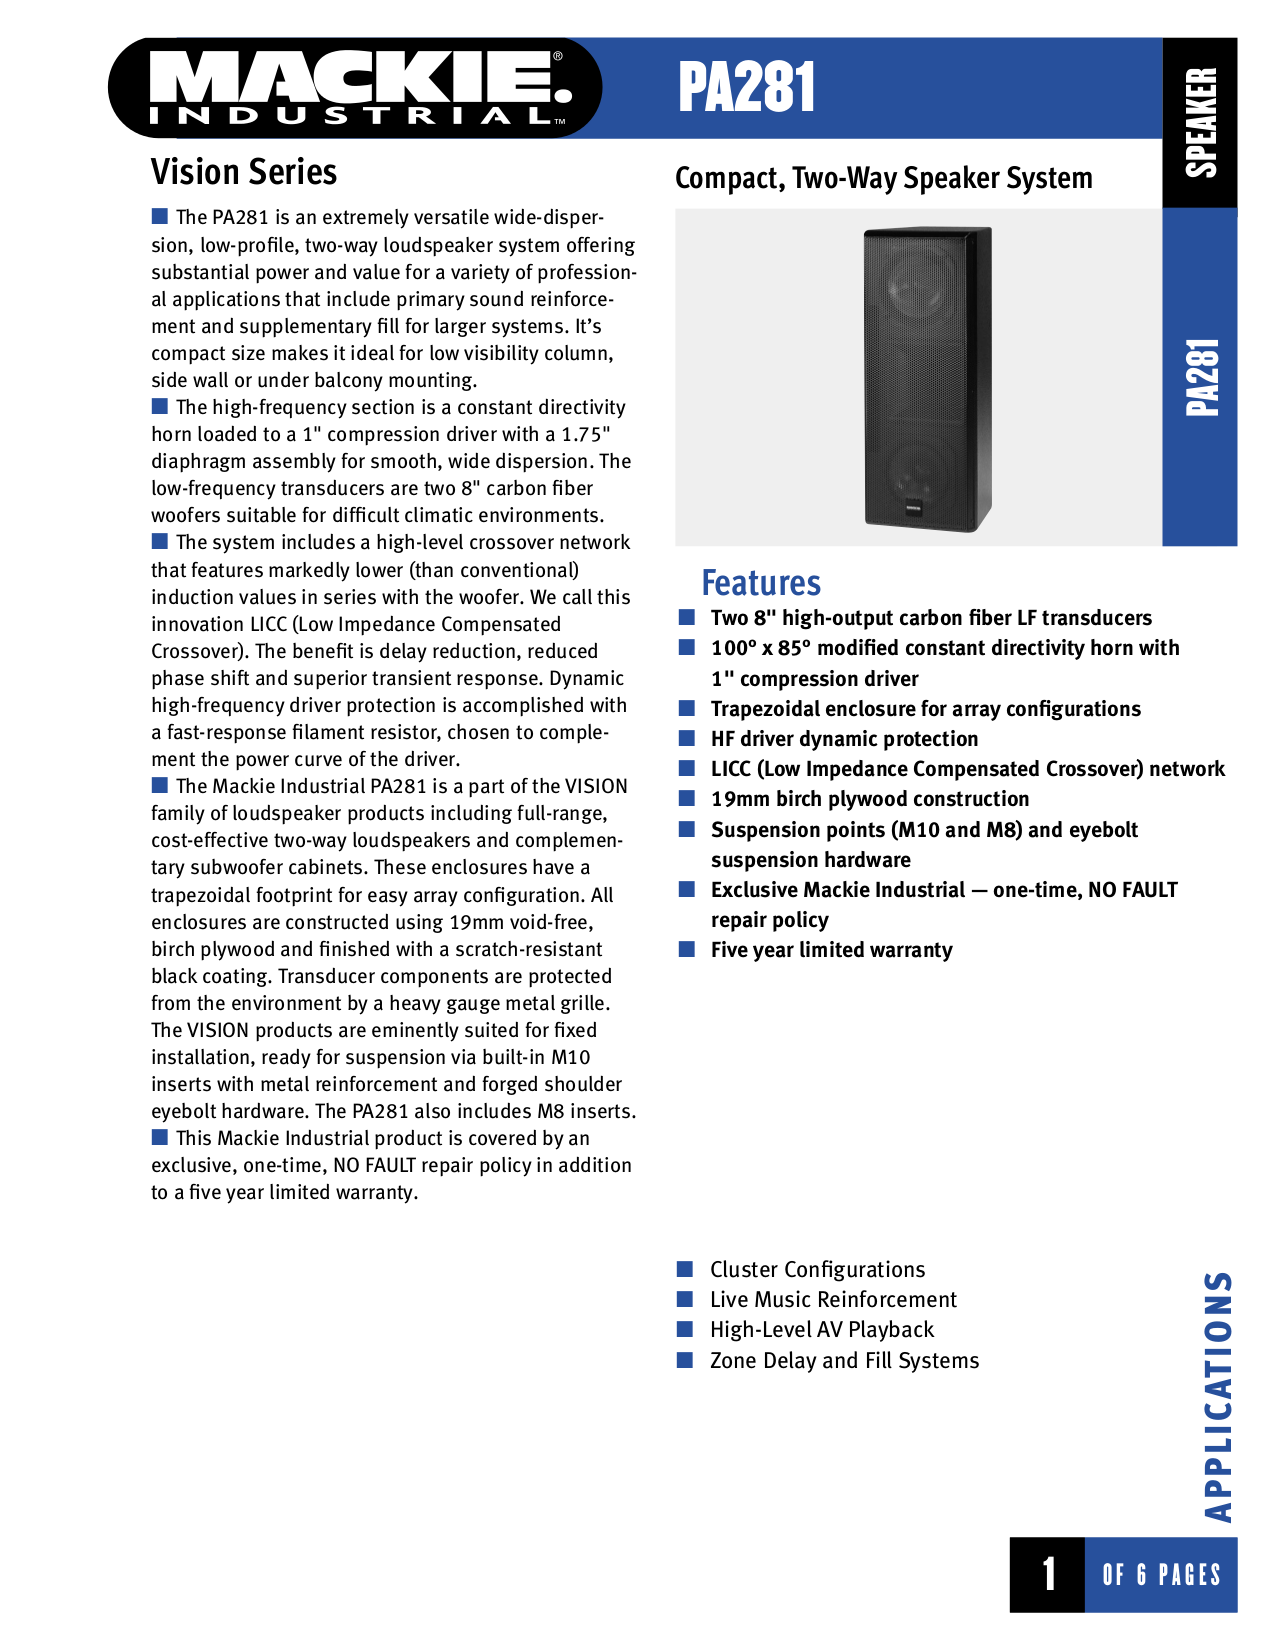 pdf for Mackie Speaker System Vision Series PA281 manual